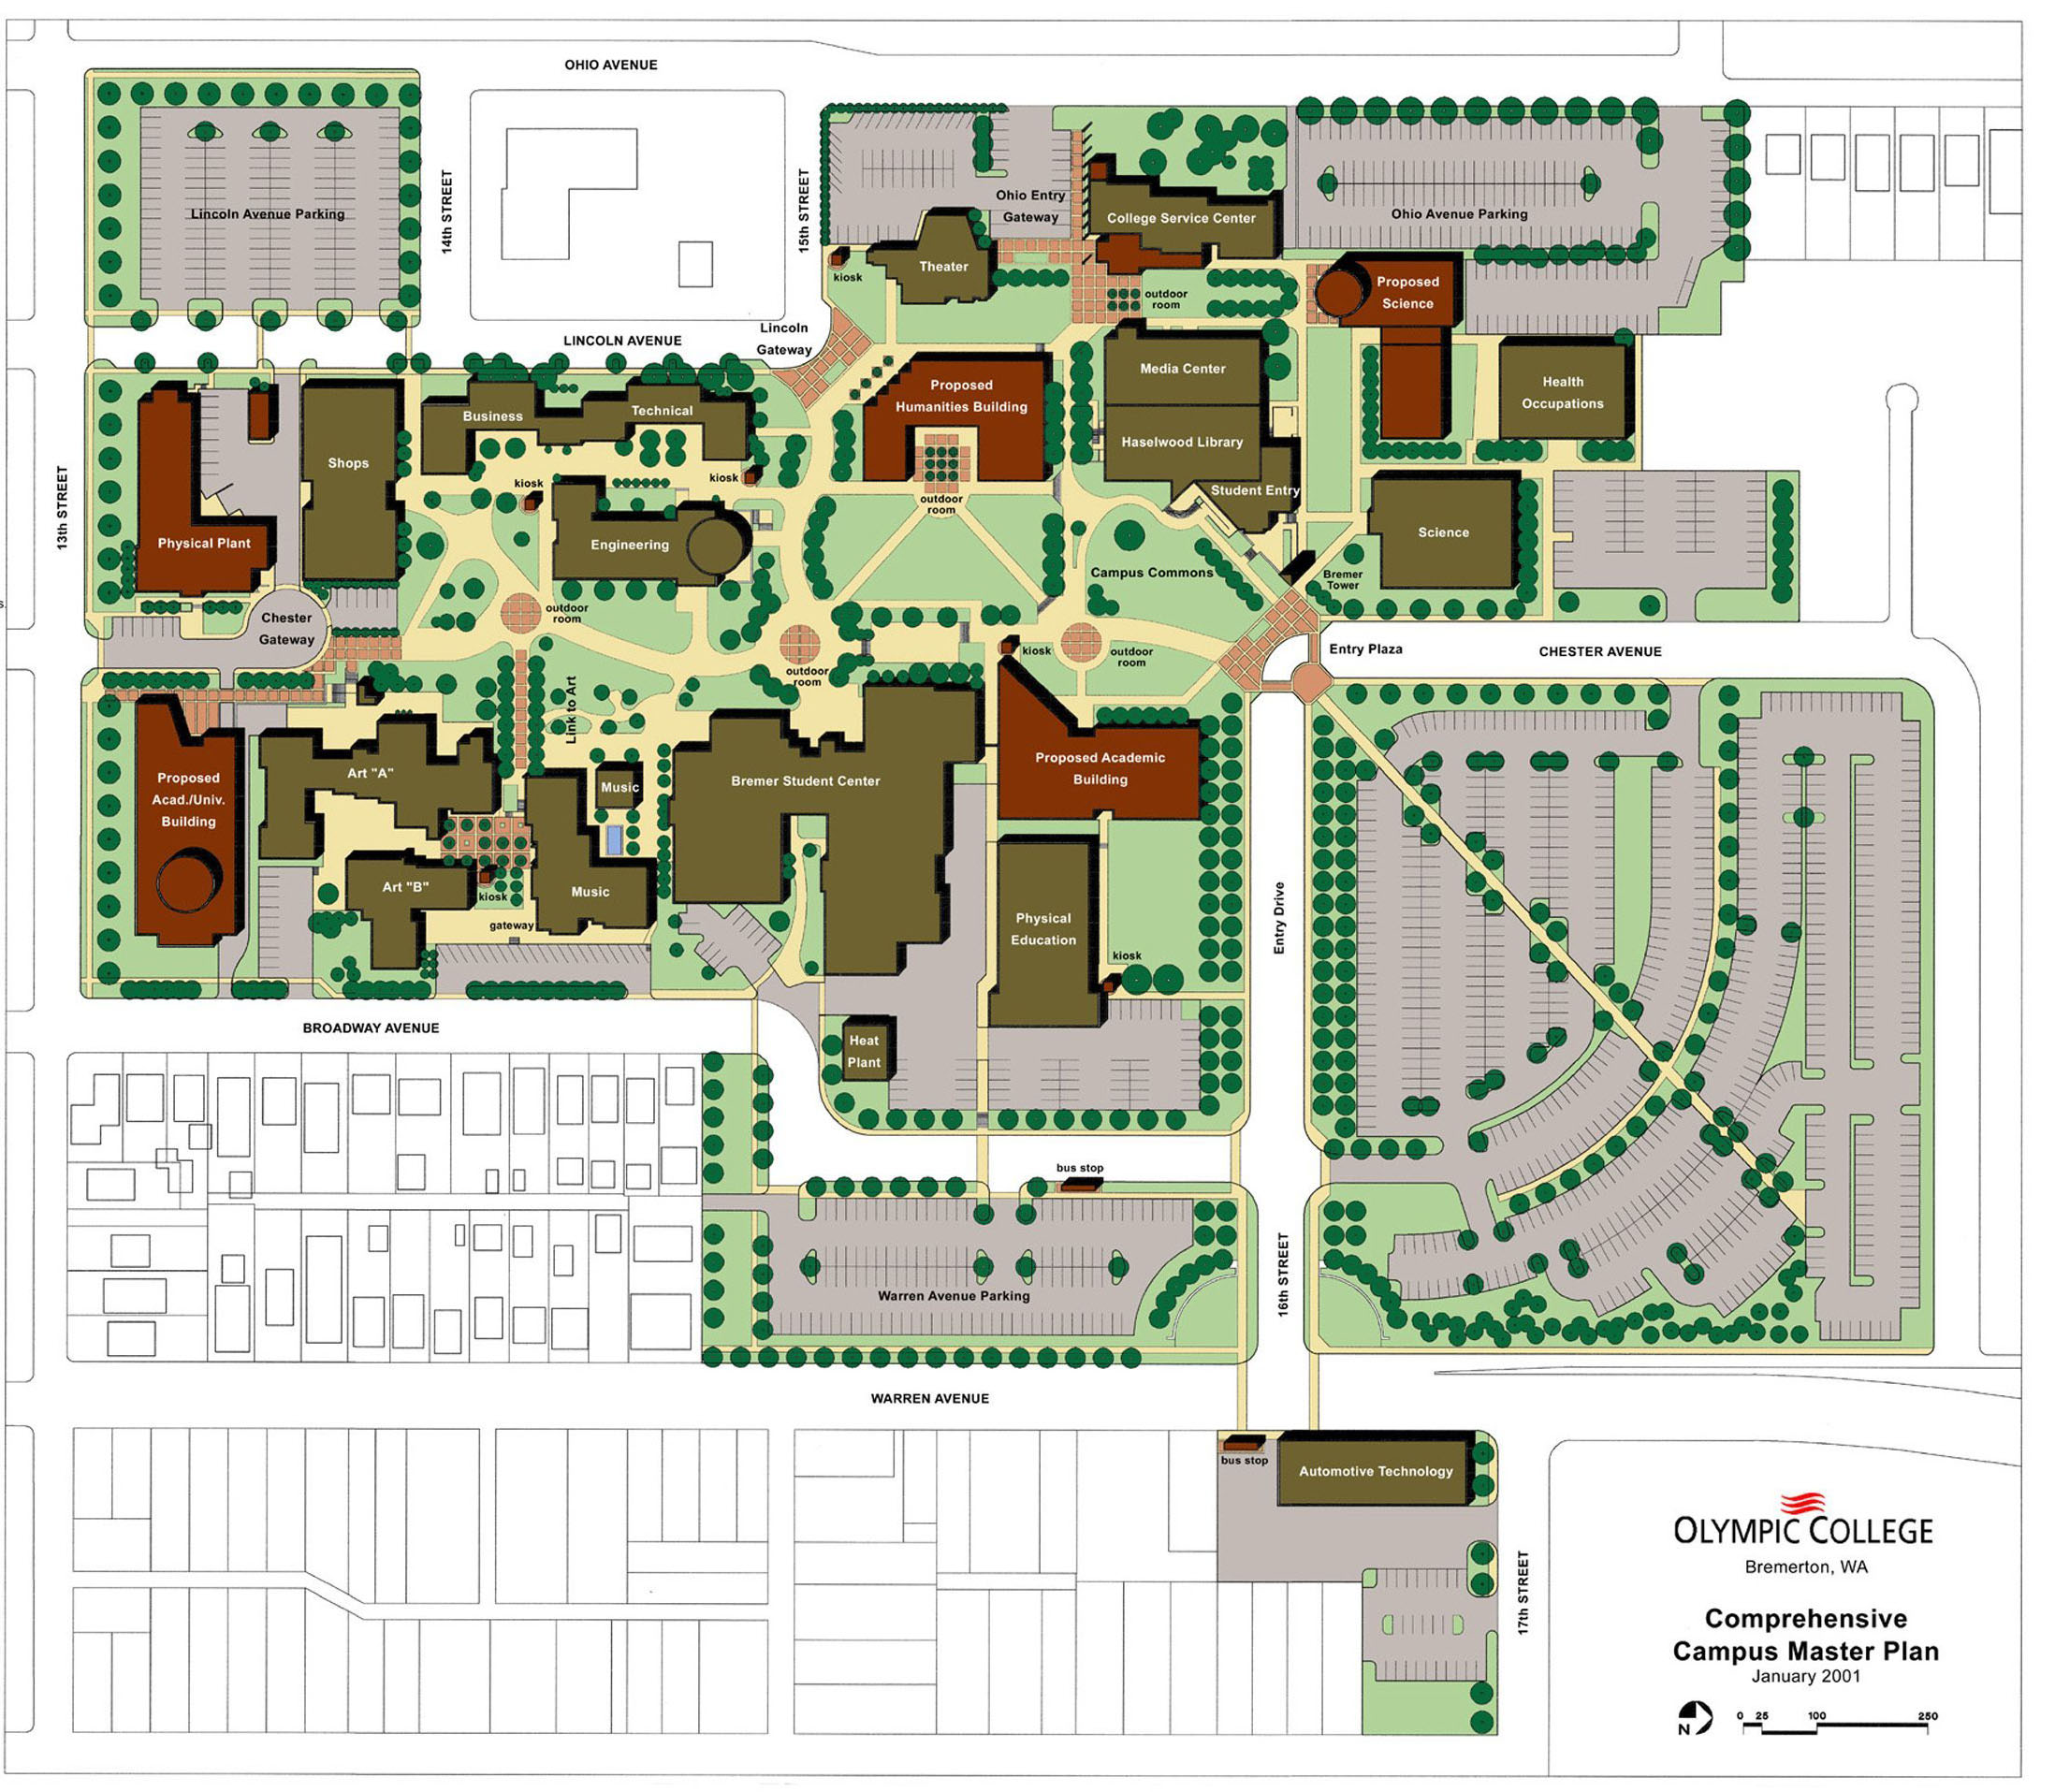 OC Ten-Year Campus Master Plan